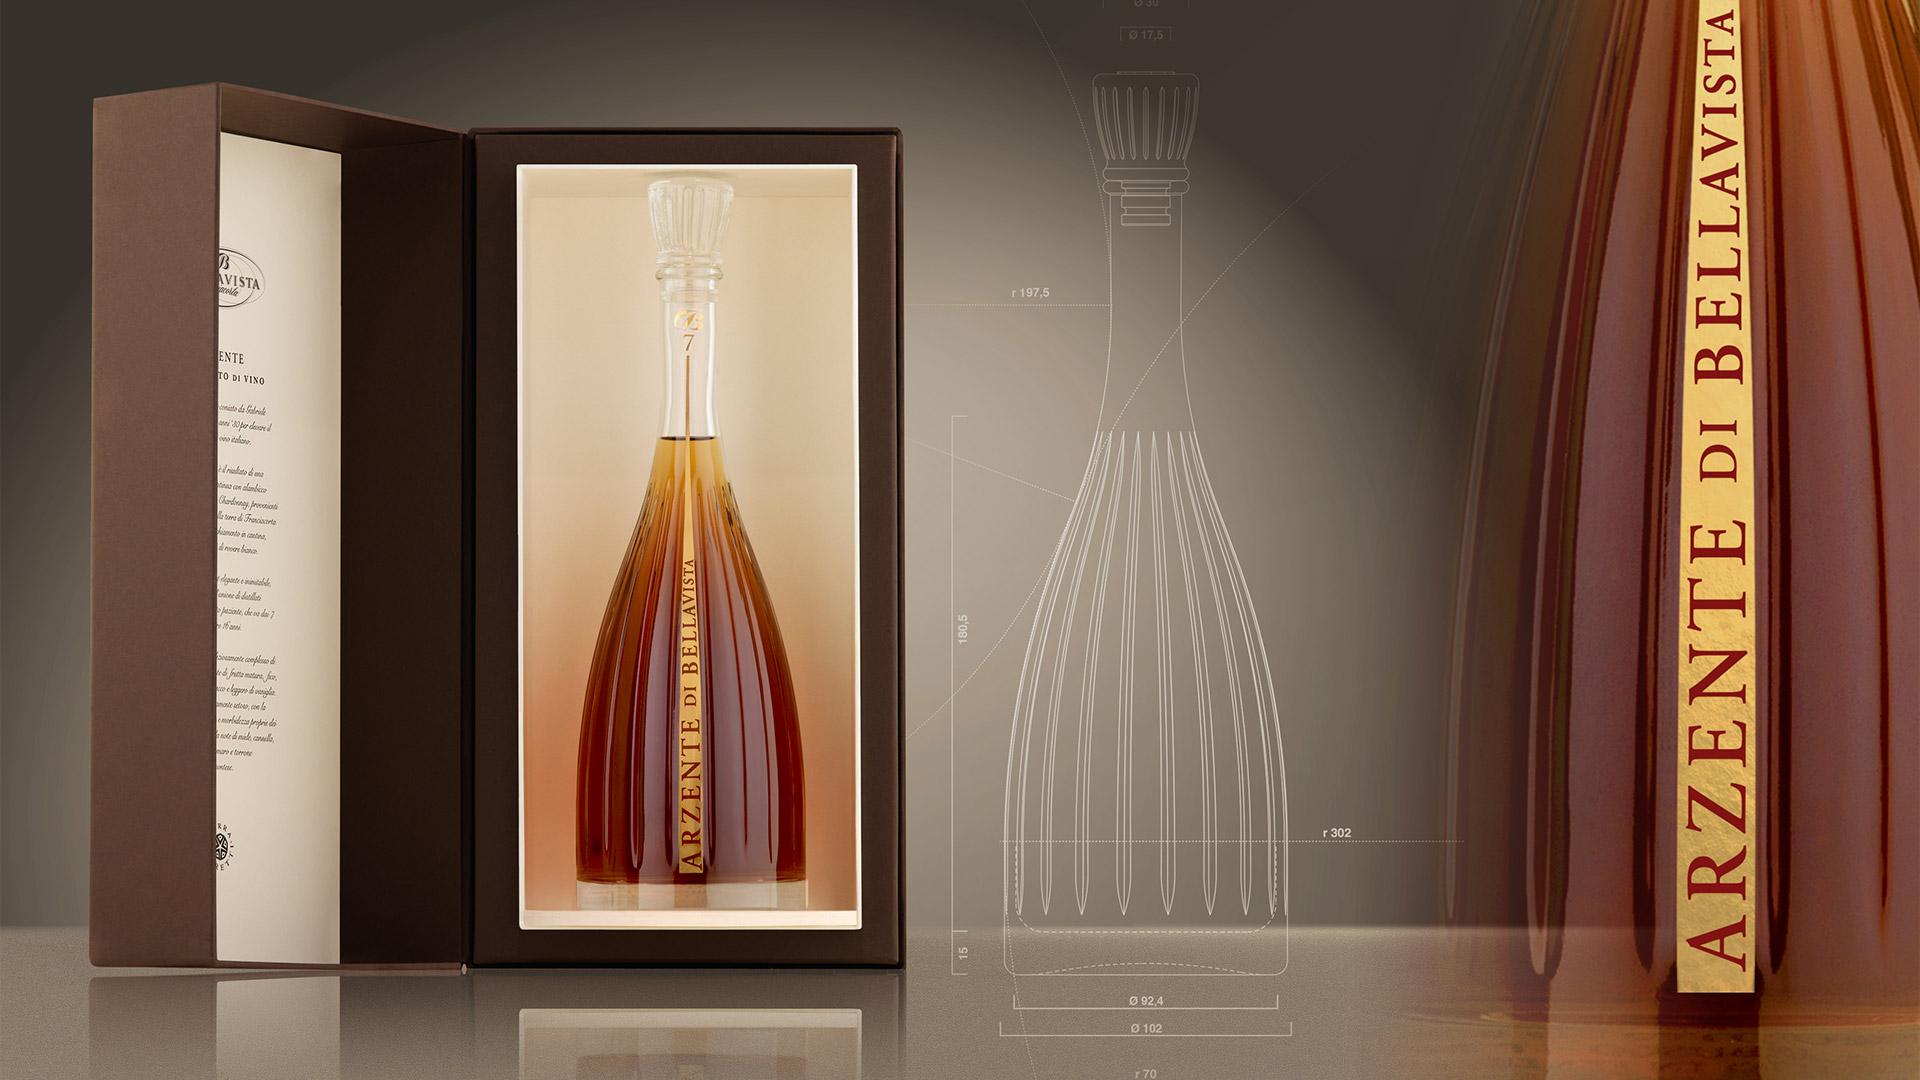 Terra Moretti Arzente bottle design